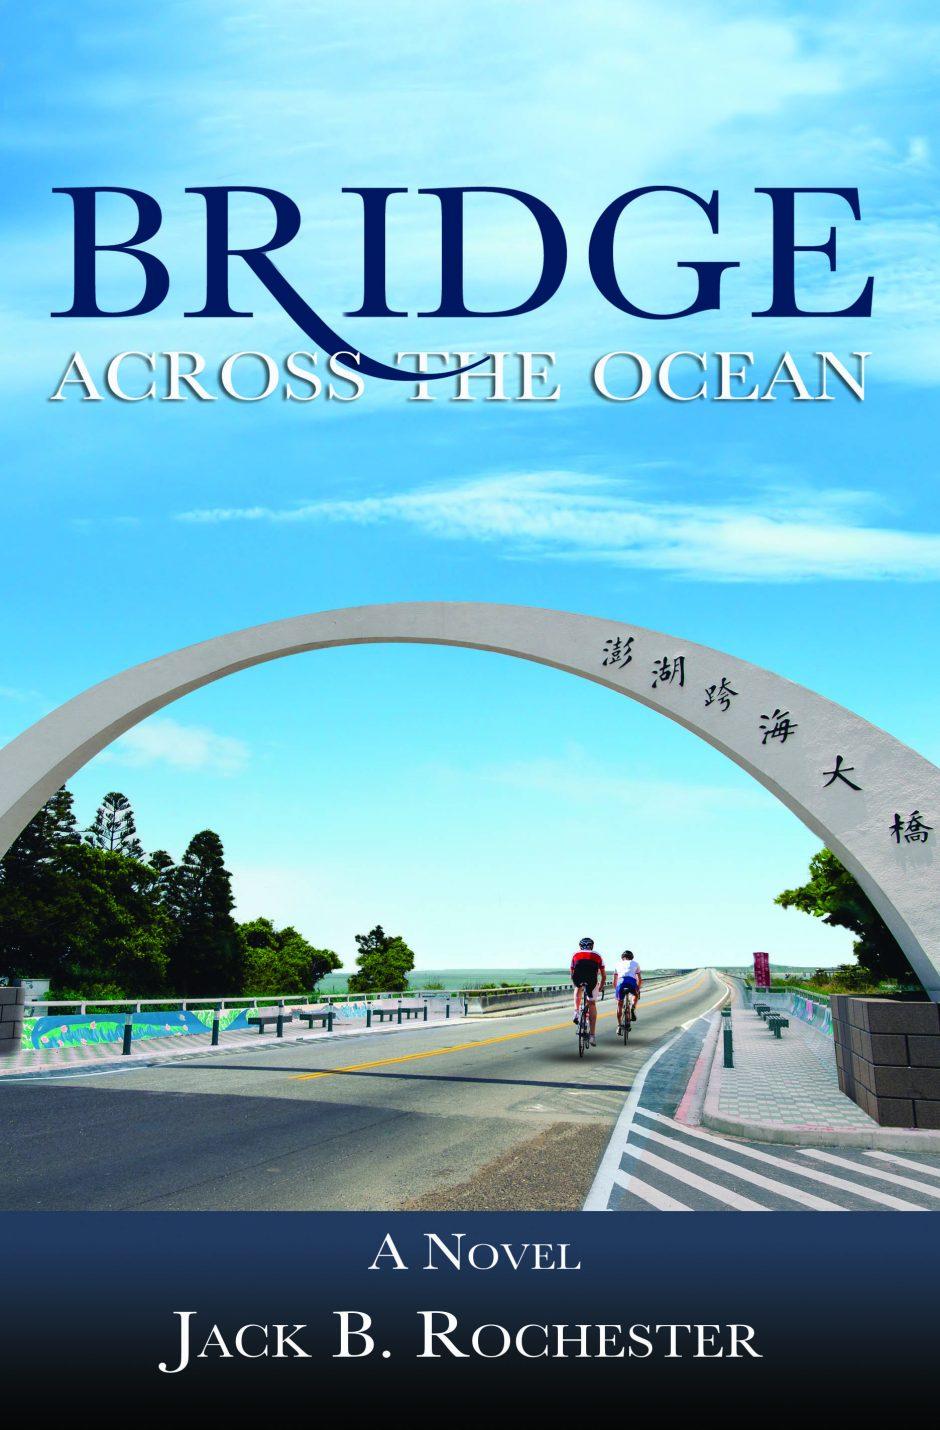 """Bridge Across the Ocean,"" a New Novel by FC Founding Barista Jack B. Rochester"